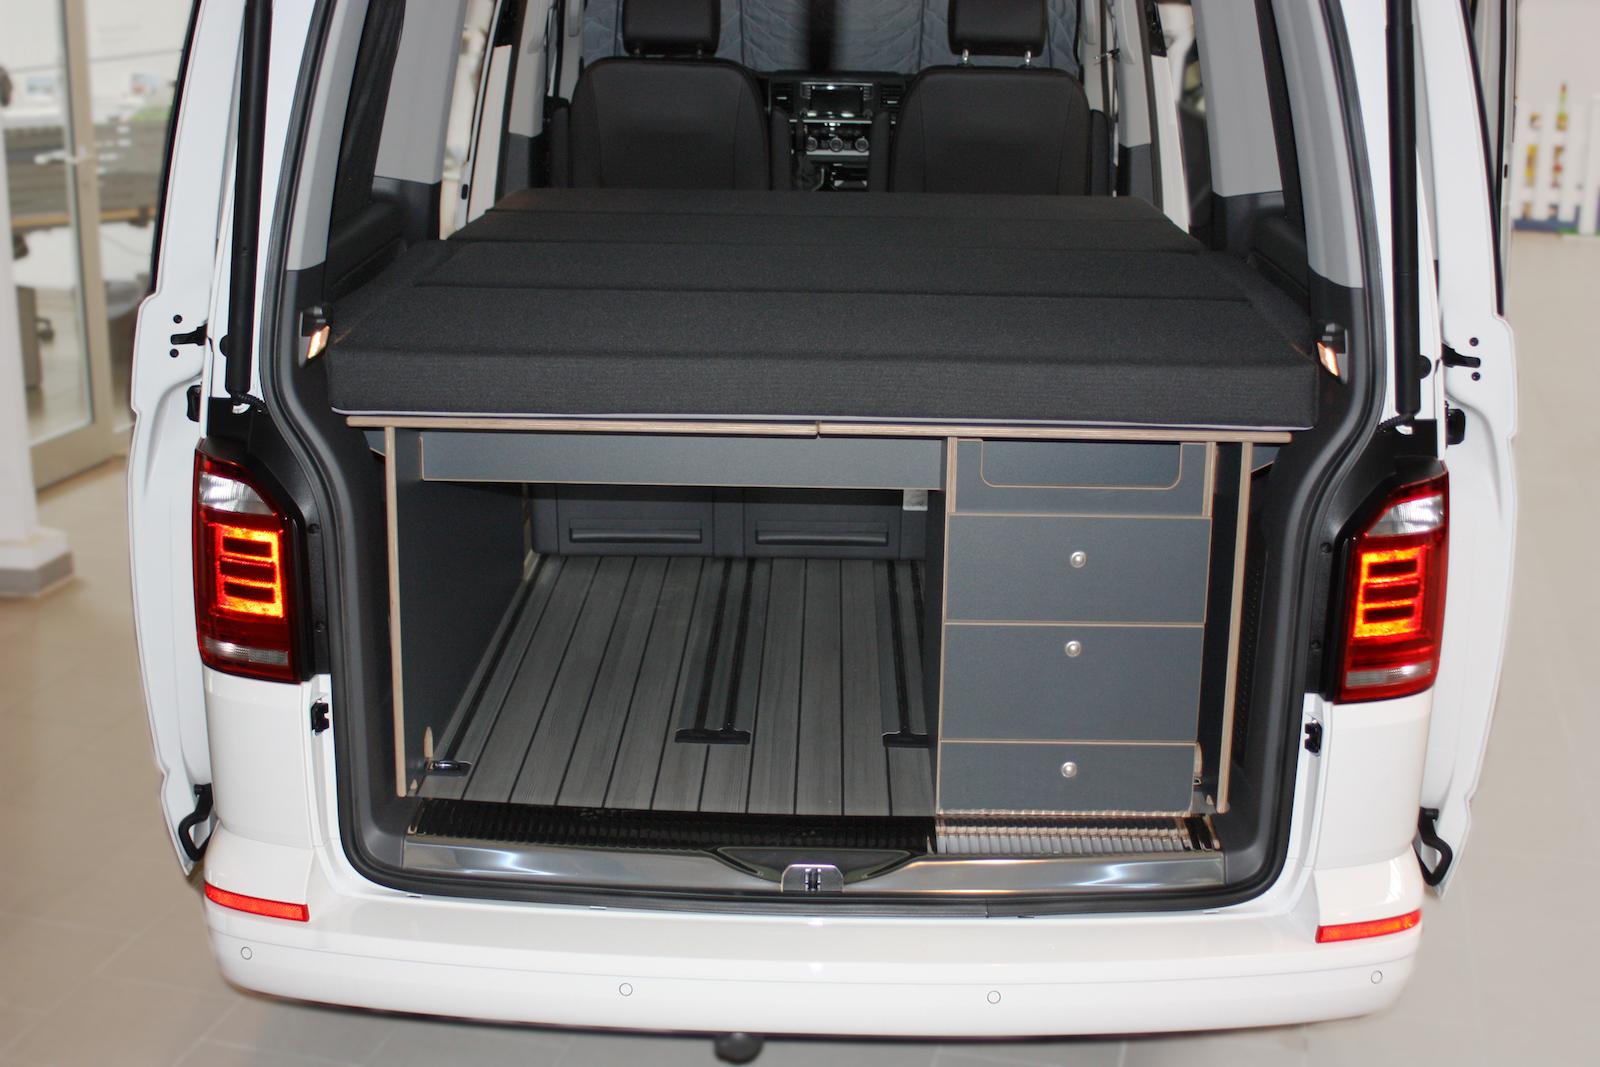 kauai camper multivan t5 t6 mobile innenausbau matsch piste. Black Bedroom Furniture Sets. Home Design Ideas